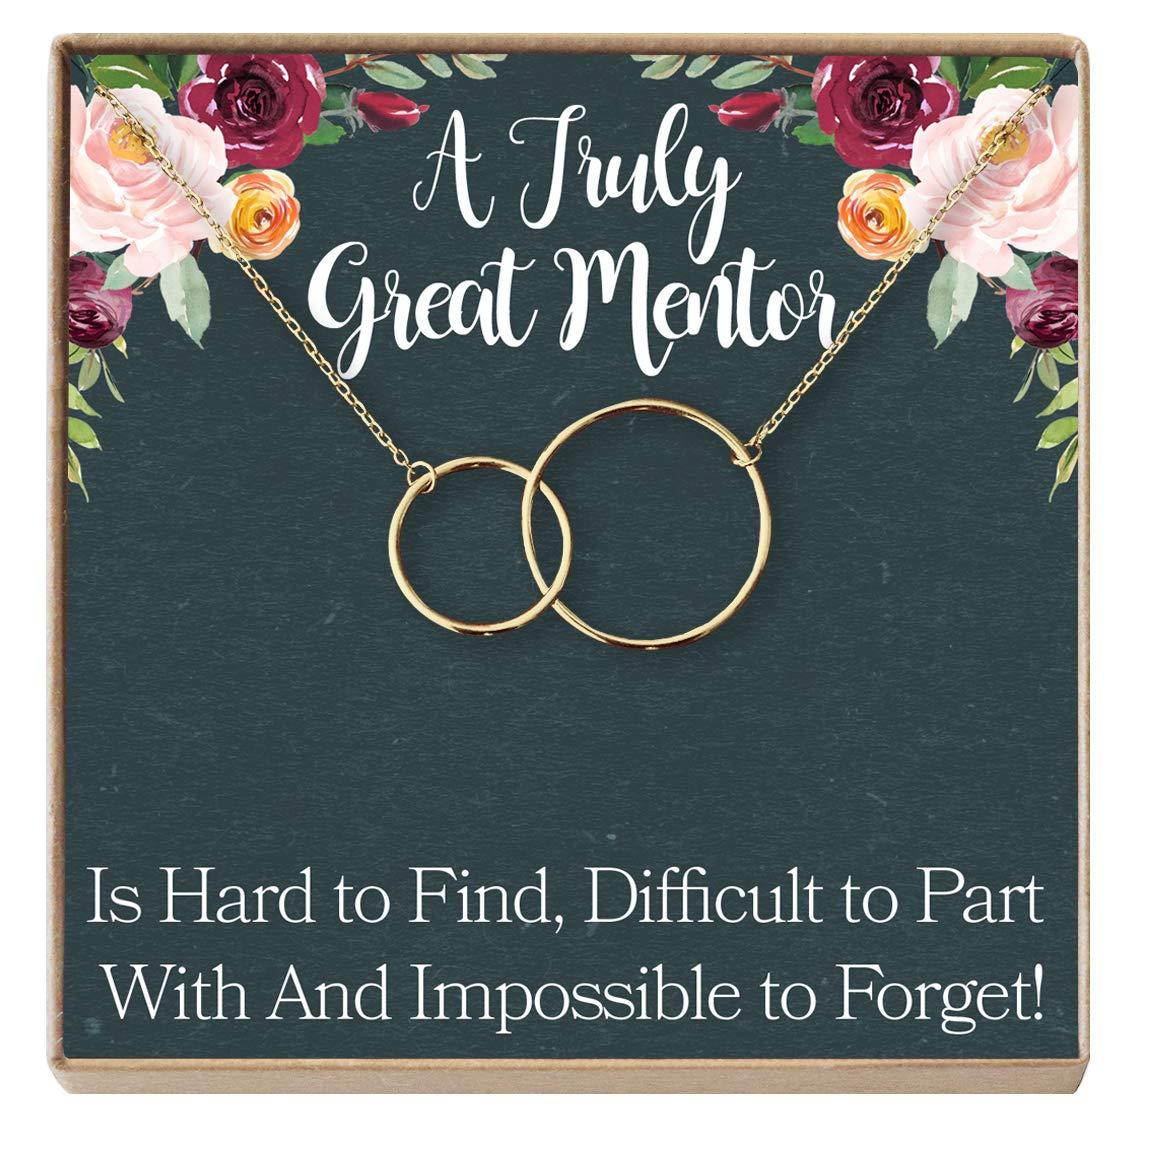 Professor Tutor Mentor Gift Necklace: Gift for Boss Coworker Teacher 2 Interlocking Circles